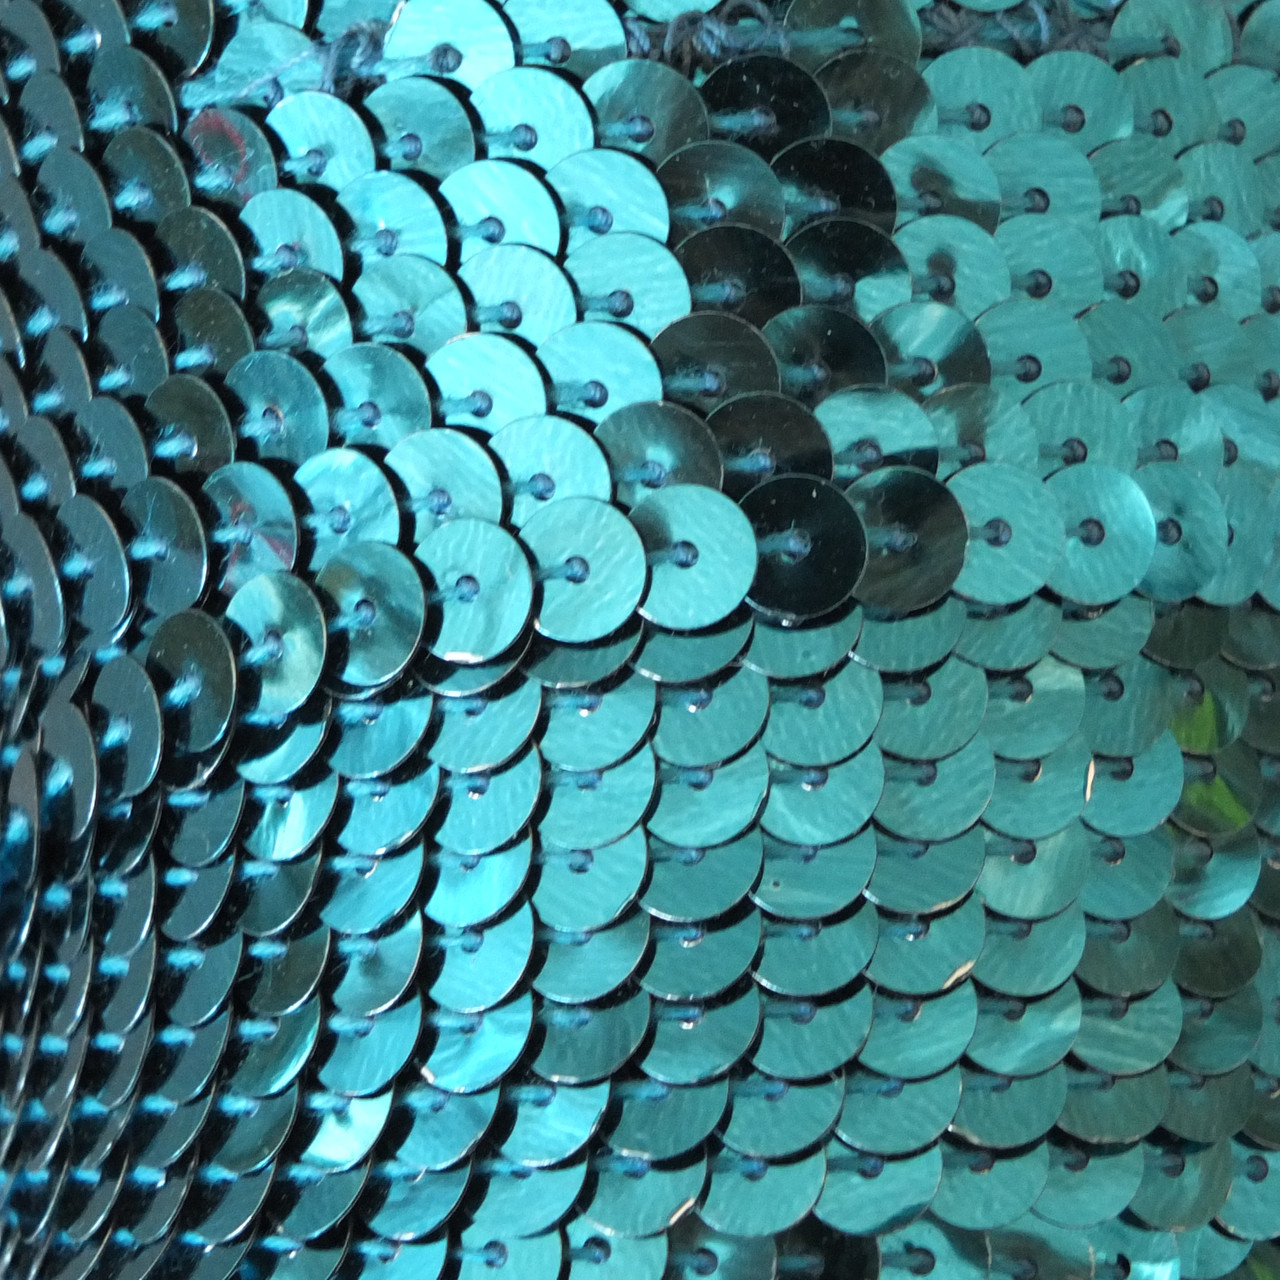 6mm Flat Round Sequin Trim Peacock Blue Green Shiny Metallic